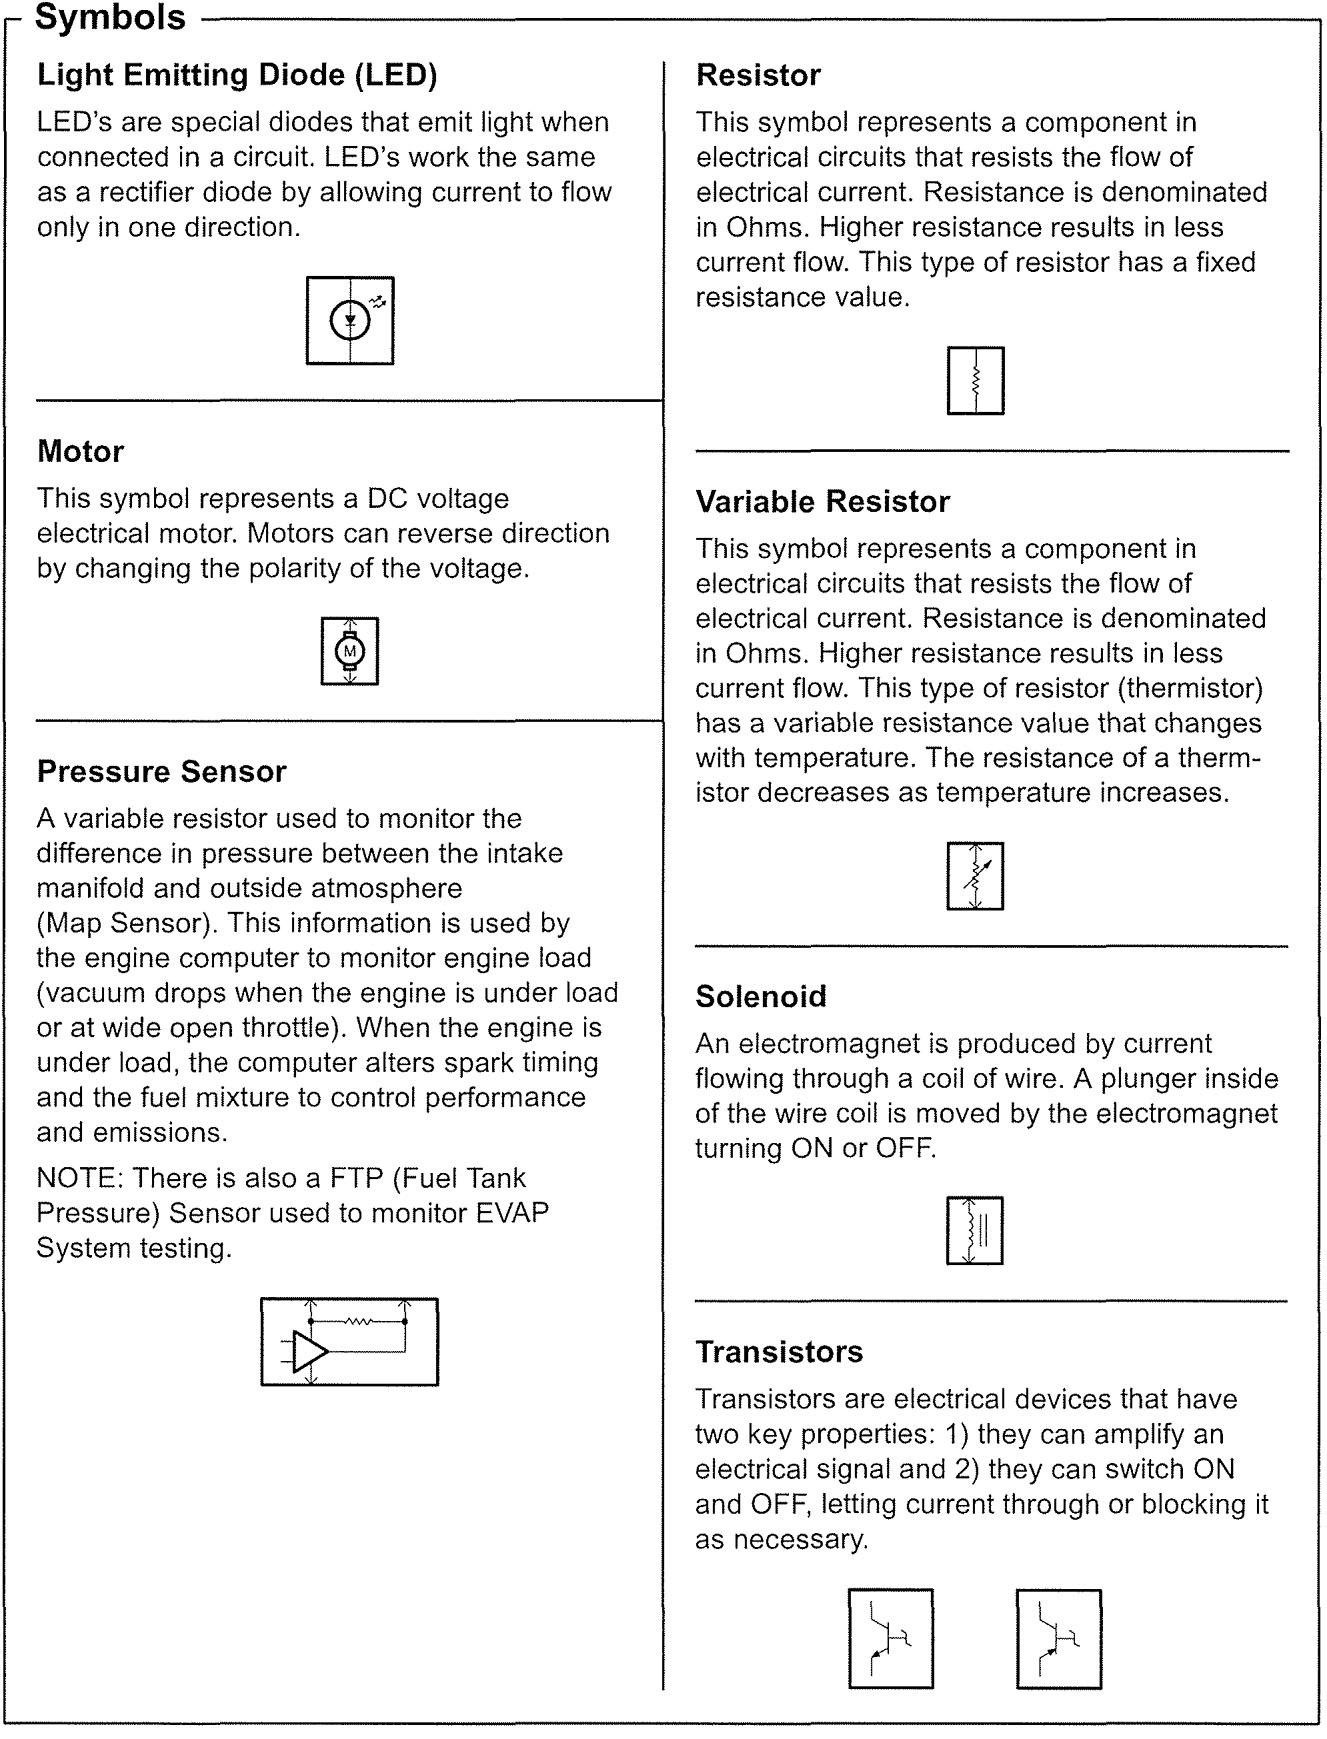 Acura Tl 2005 2007 Wiring Diagrams Symbol Id Carknowledge Map Sensor Wire Diagram 4 Part